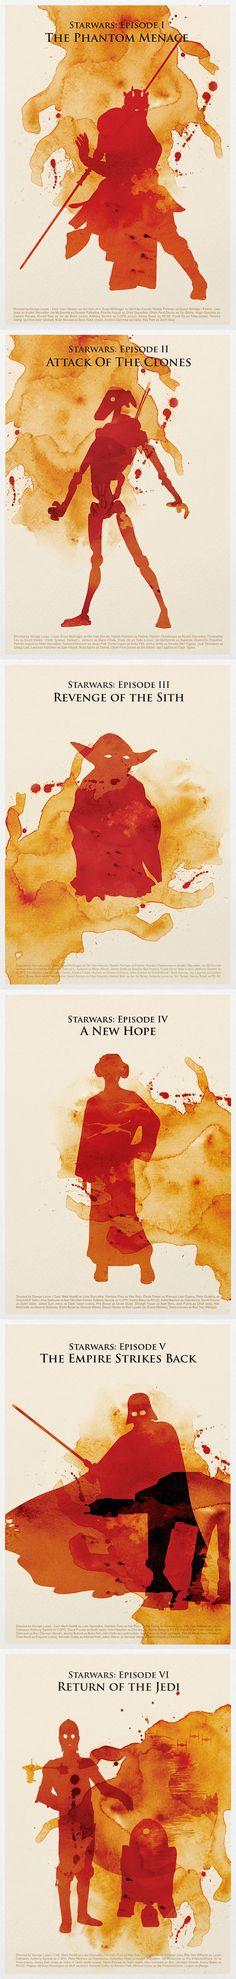 Poster of Star Wars Episode